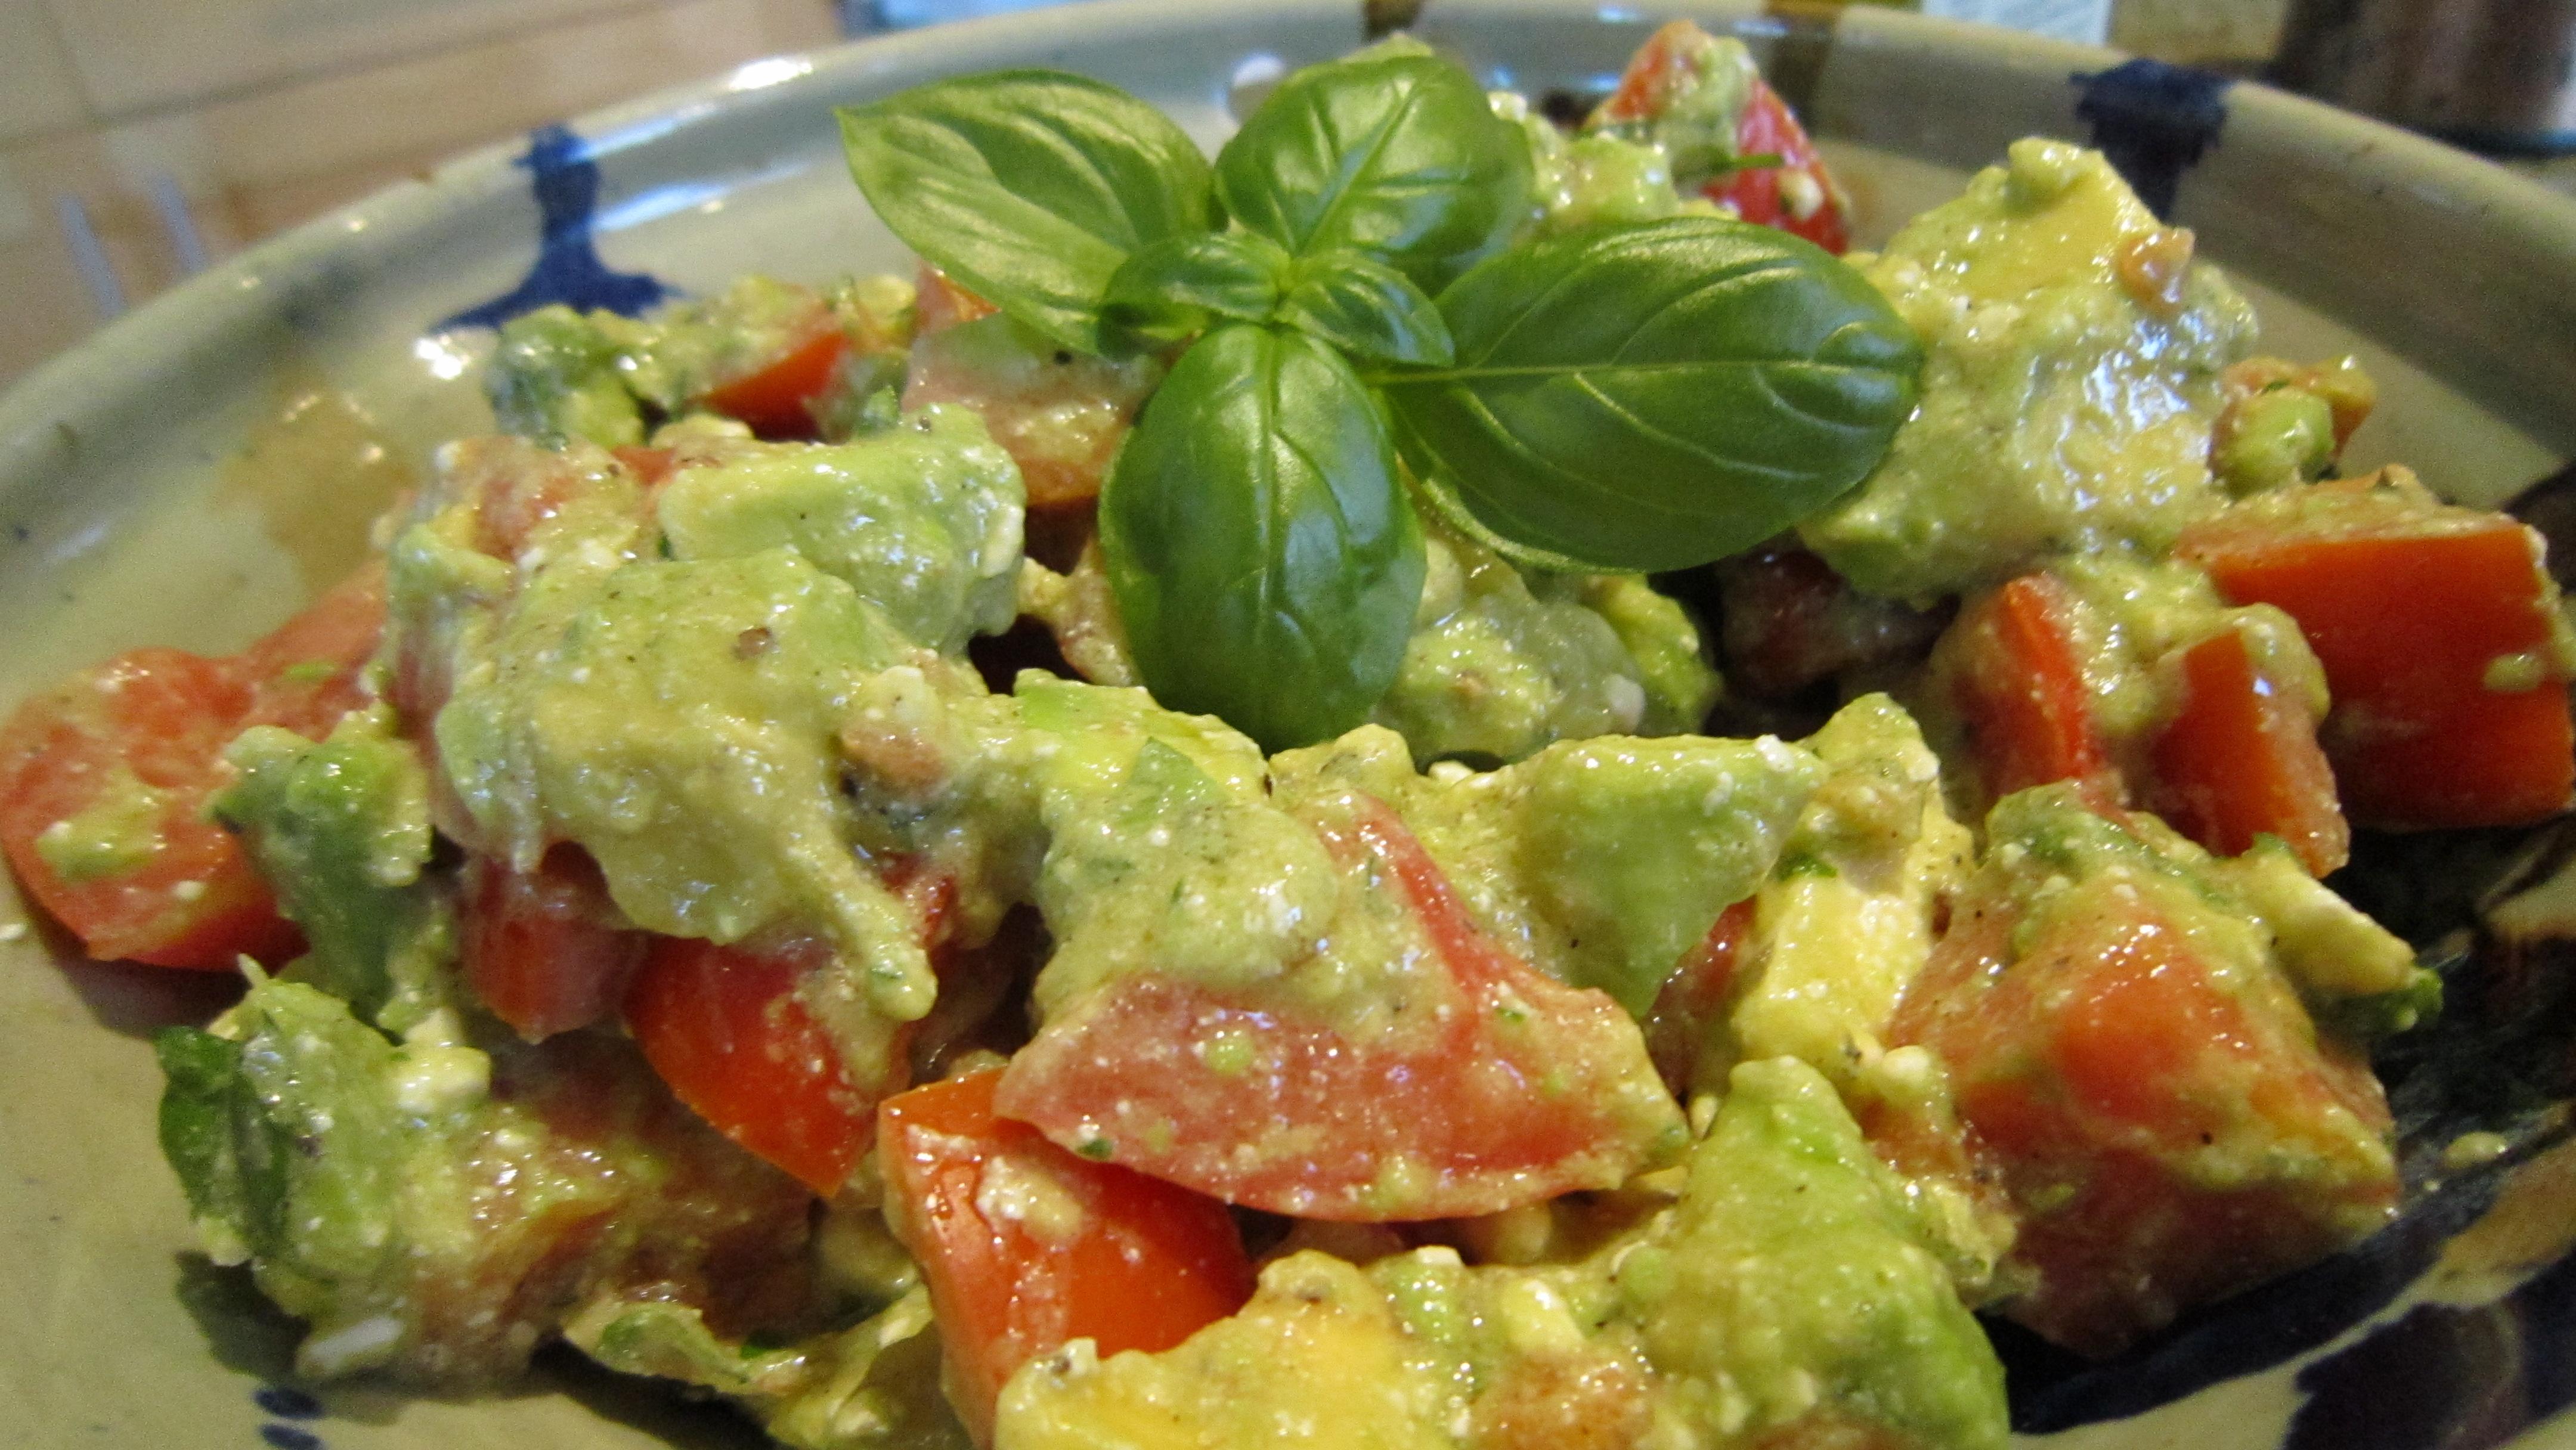 Creamy Avocado, Basil, Feta & Tomato Salad....